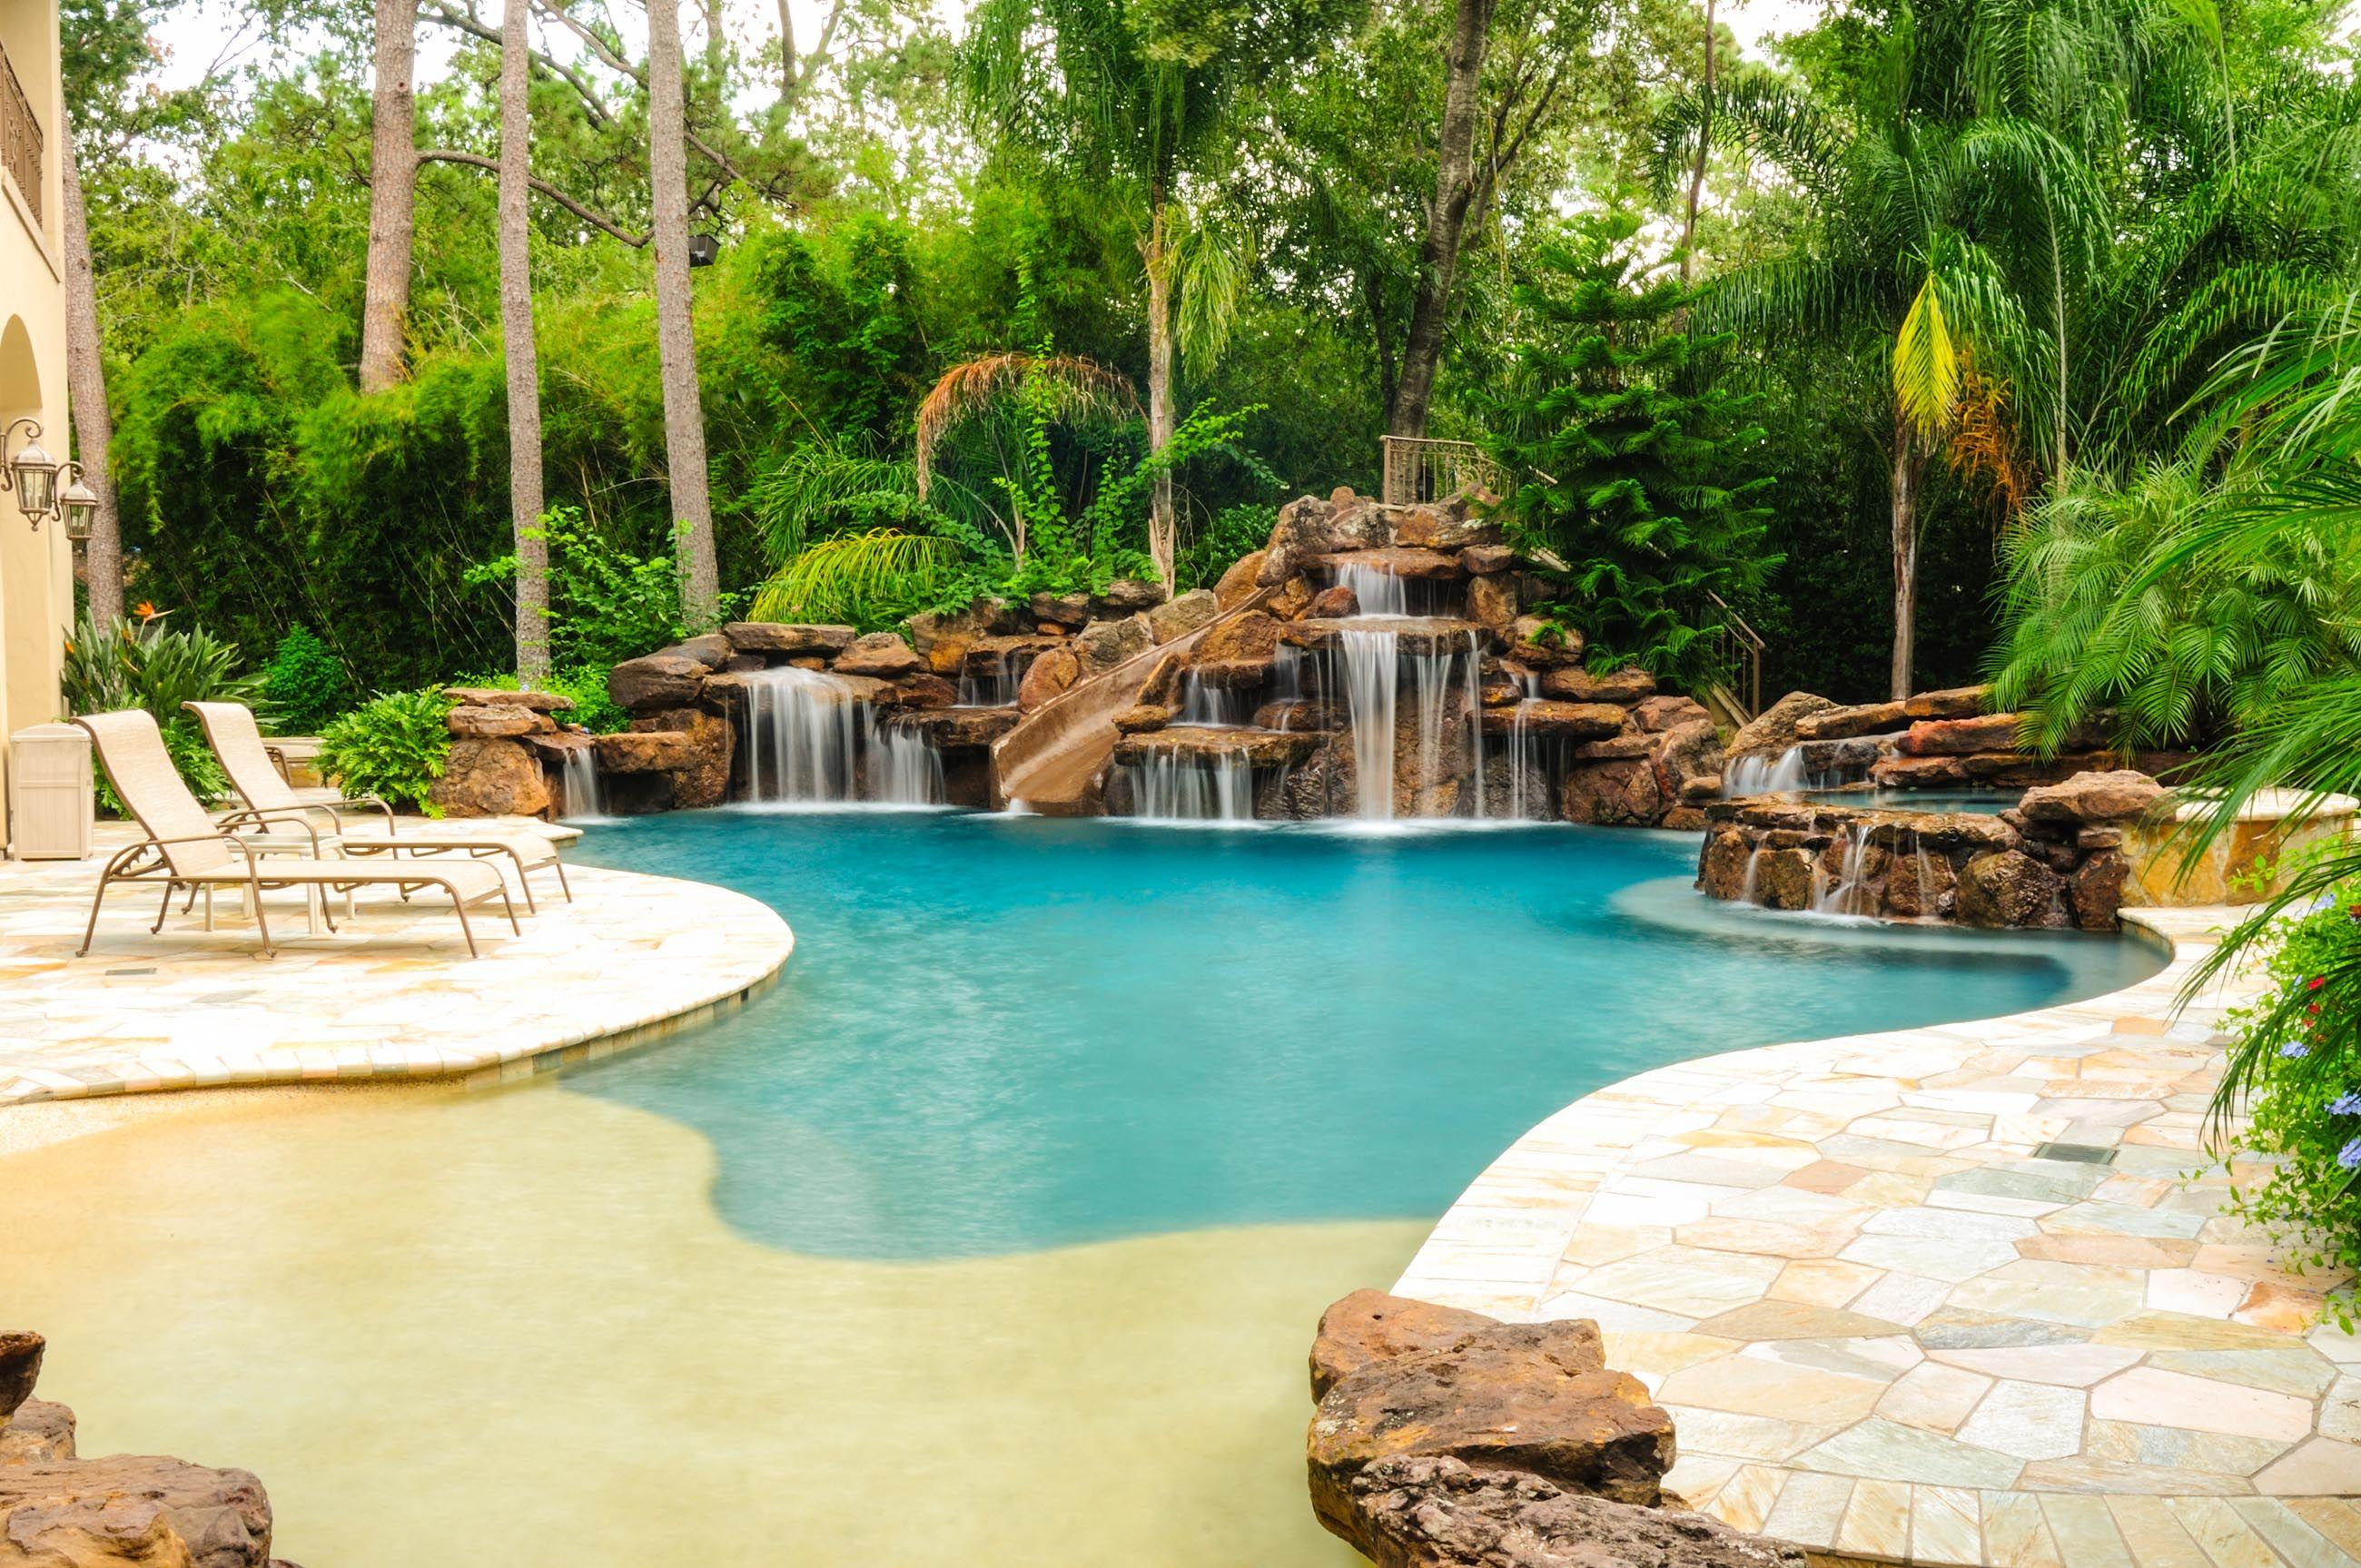 Custom Swimming Pools Priced Between 50k 100k Platinum Pools